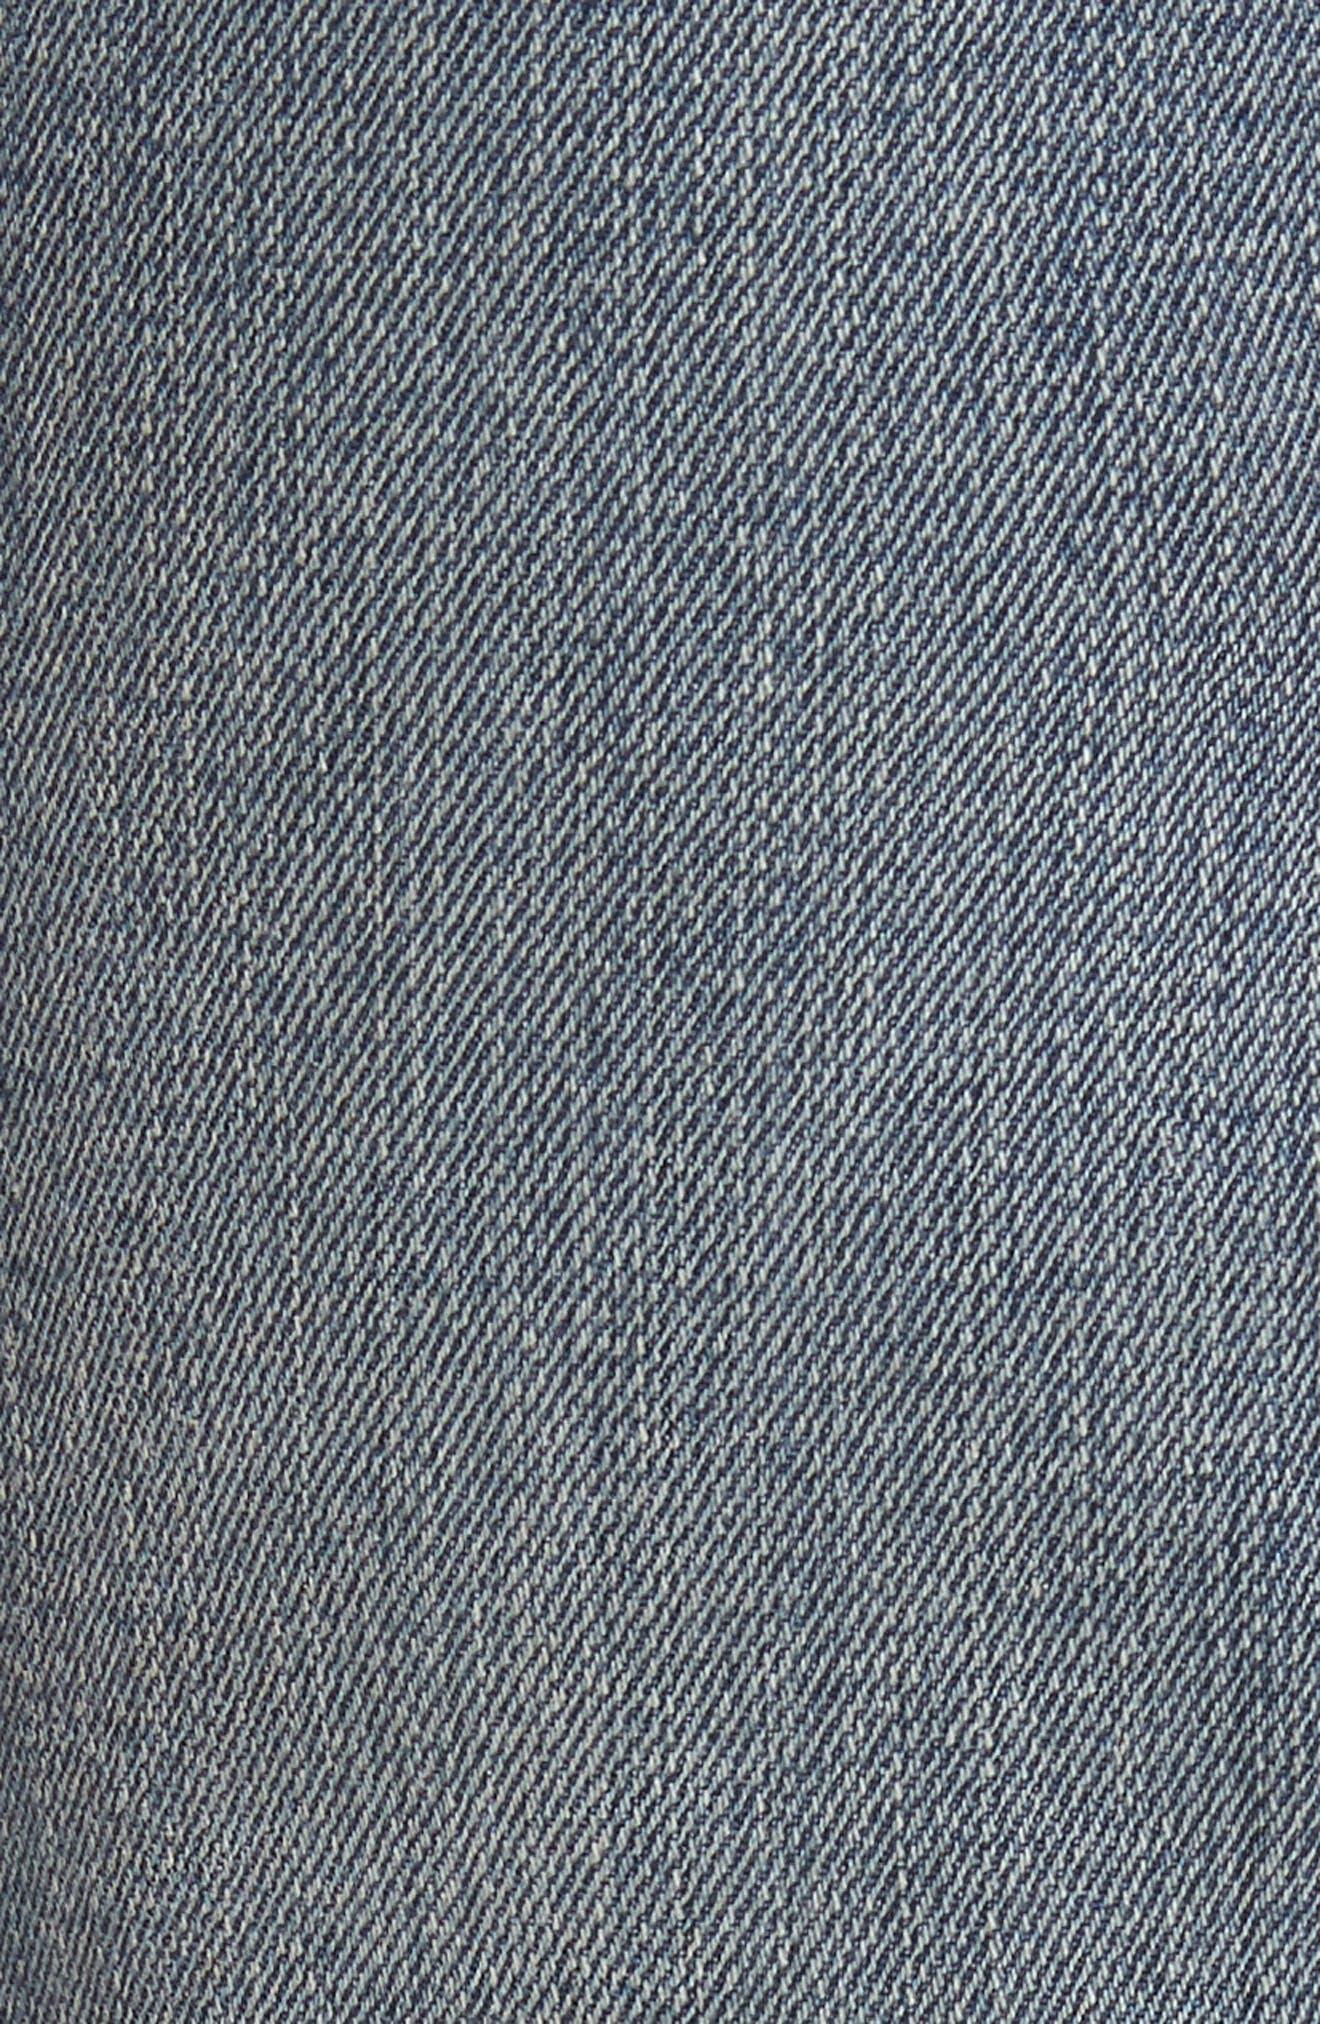 Alternate Image 5  - PARKER SMITH Ava Crop Skinny Jeans (Madeline)